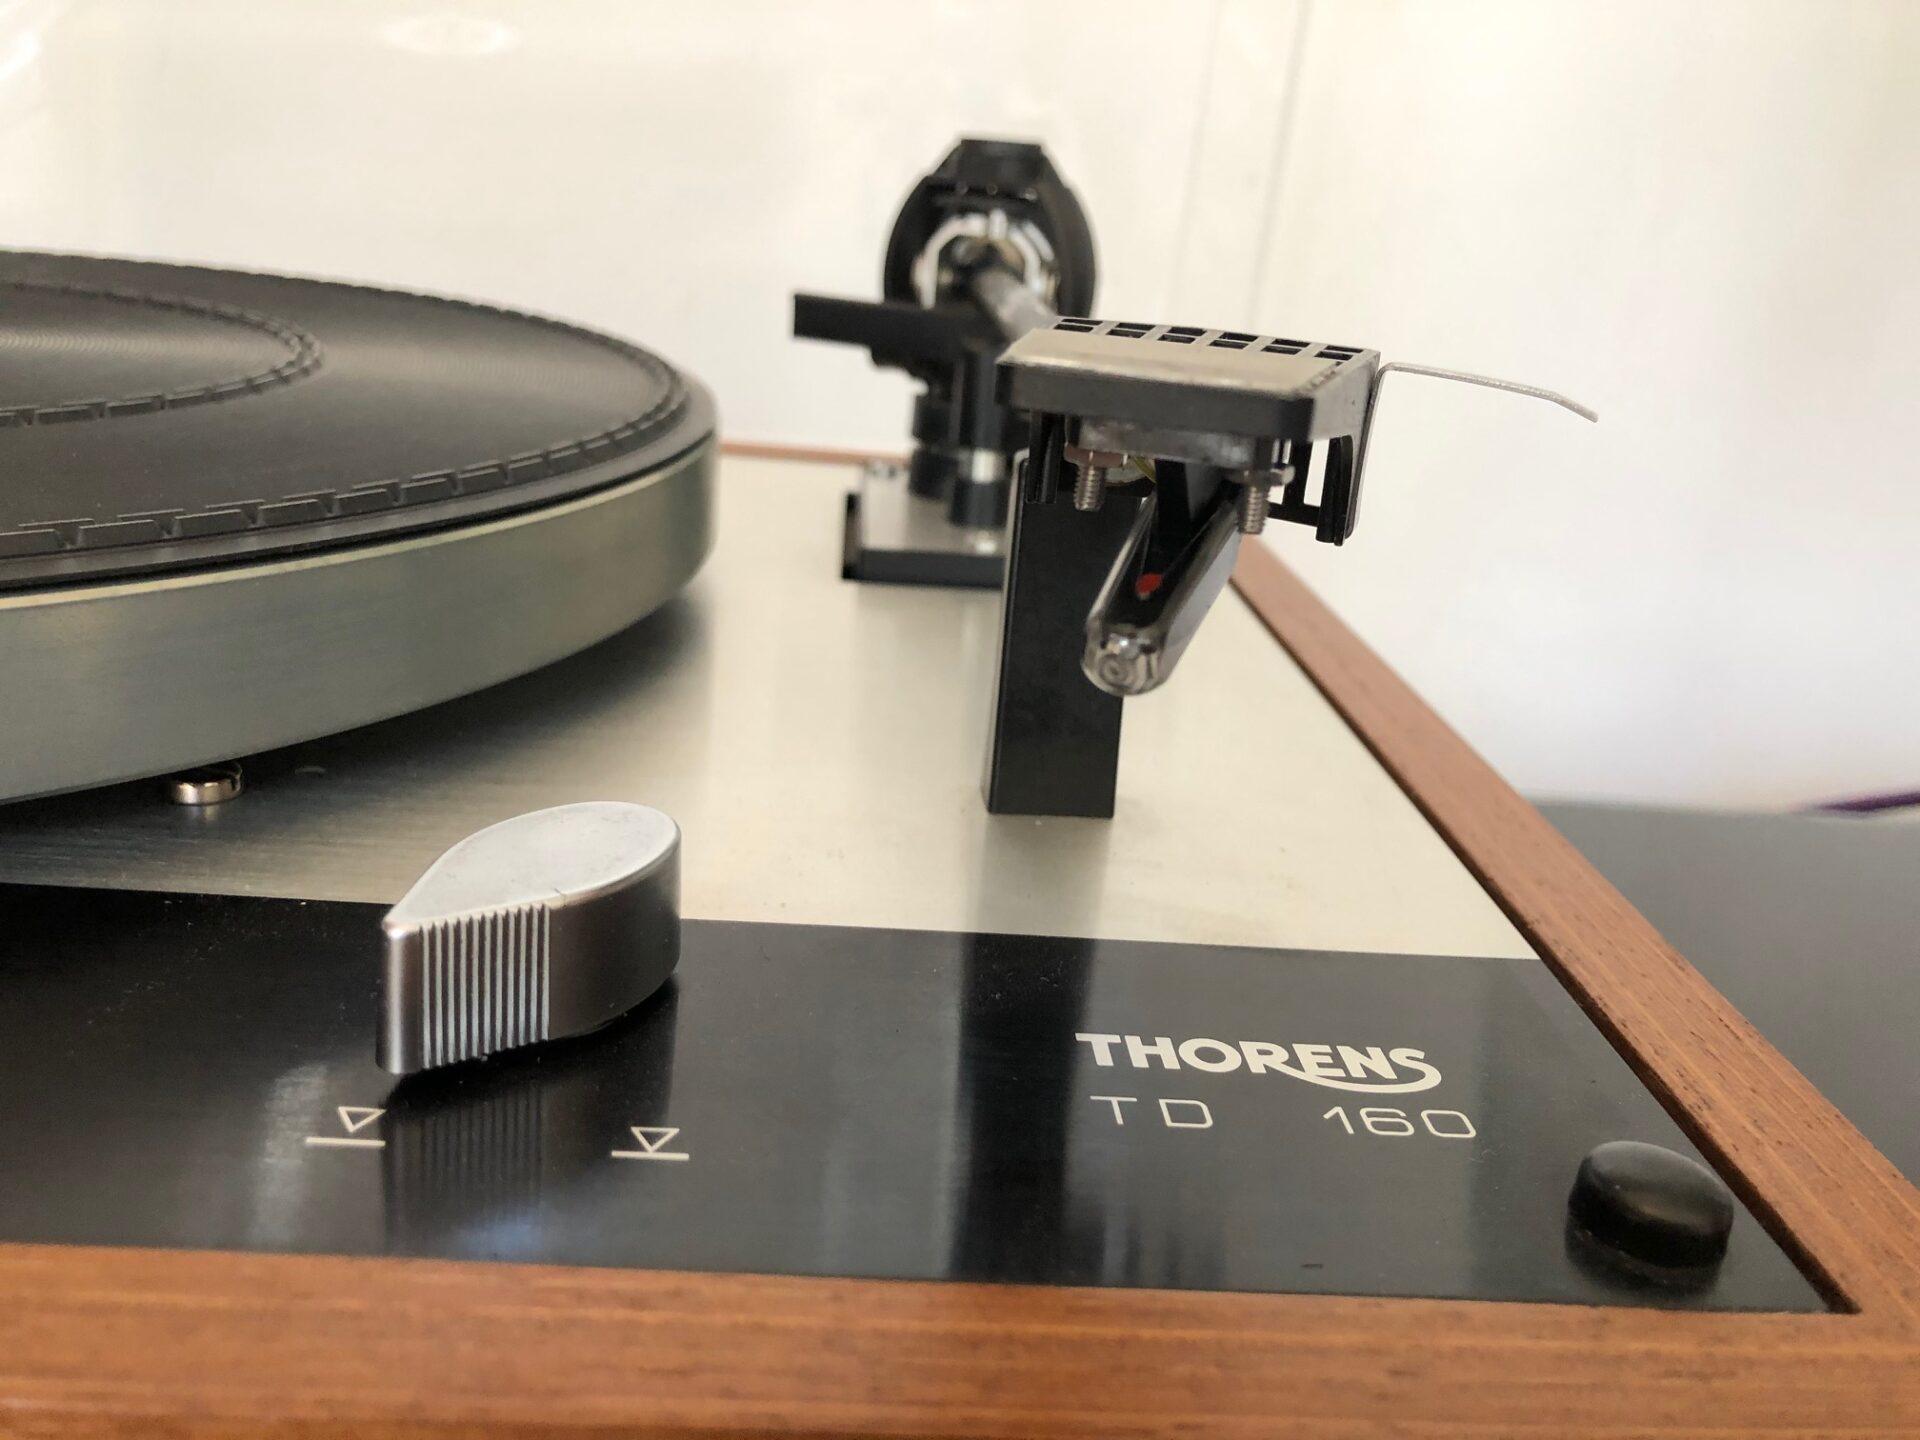 Thorens TD 160 10